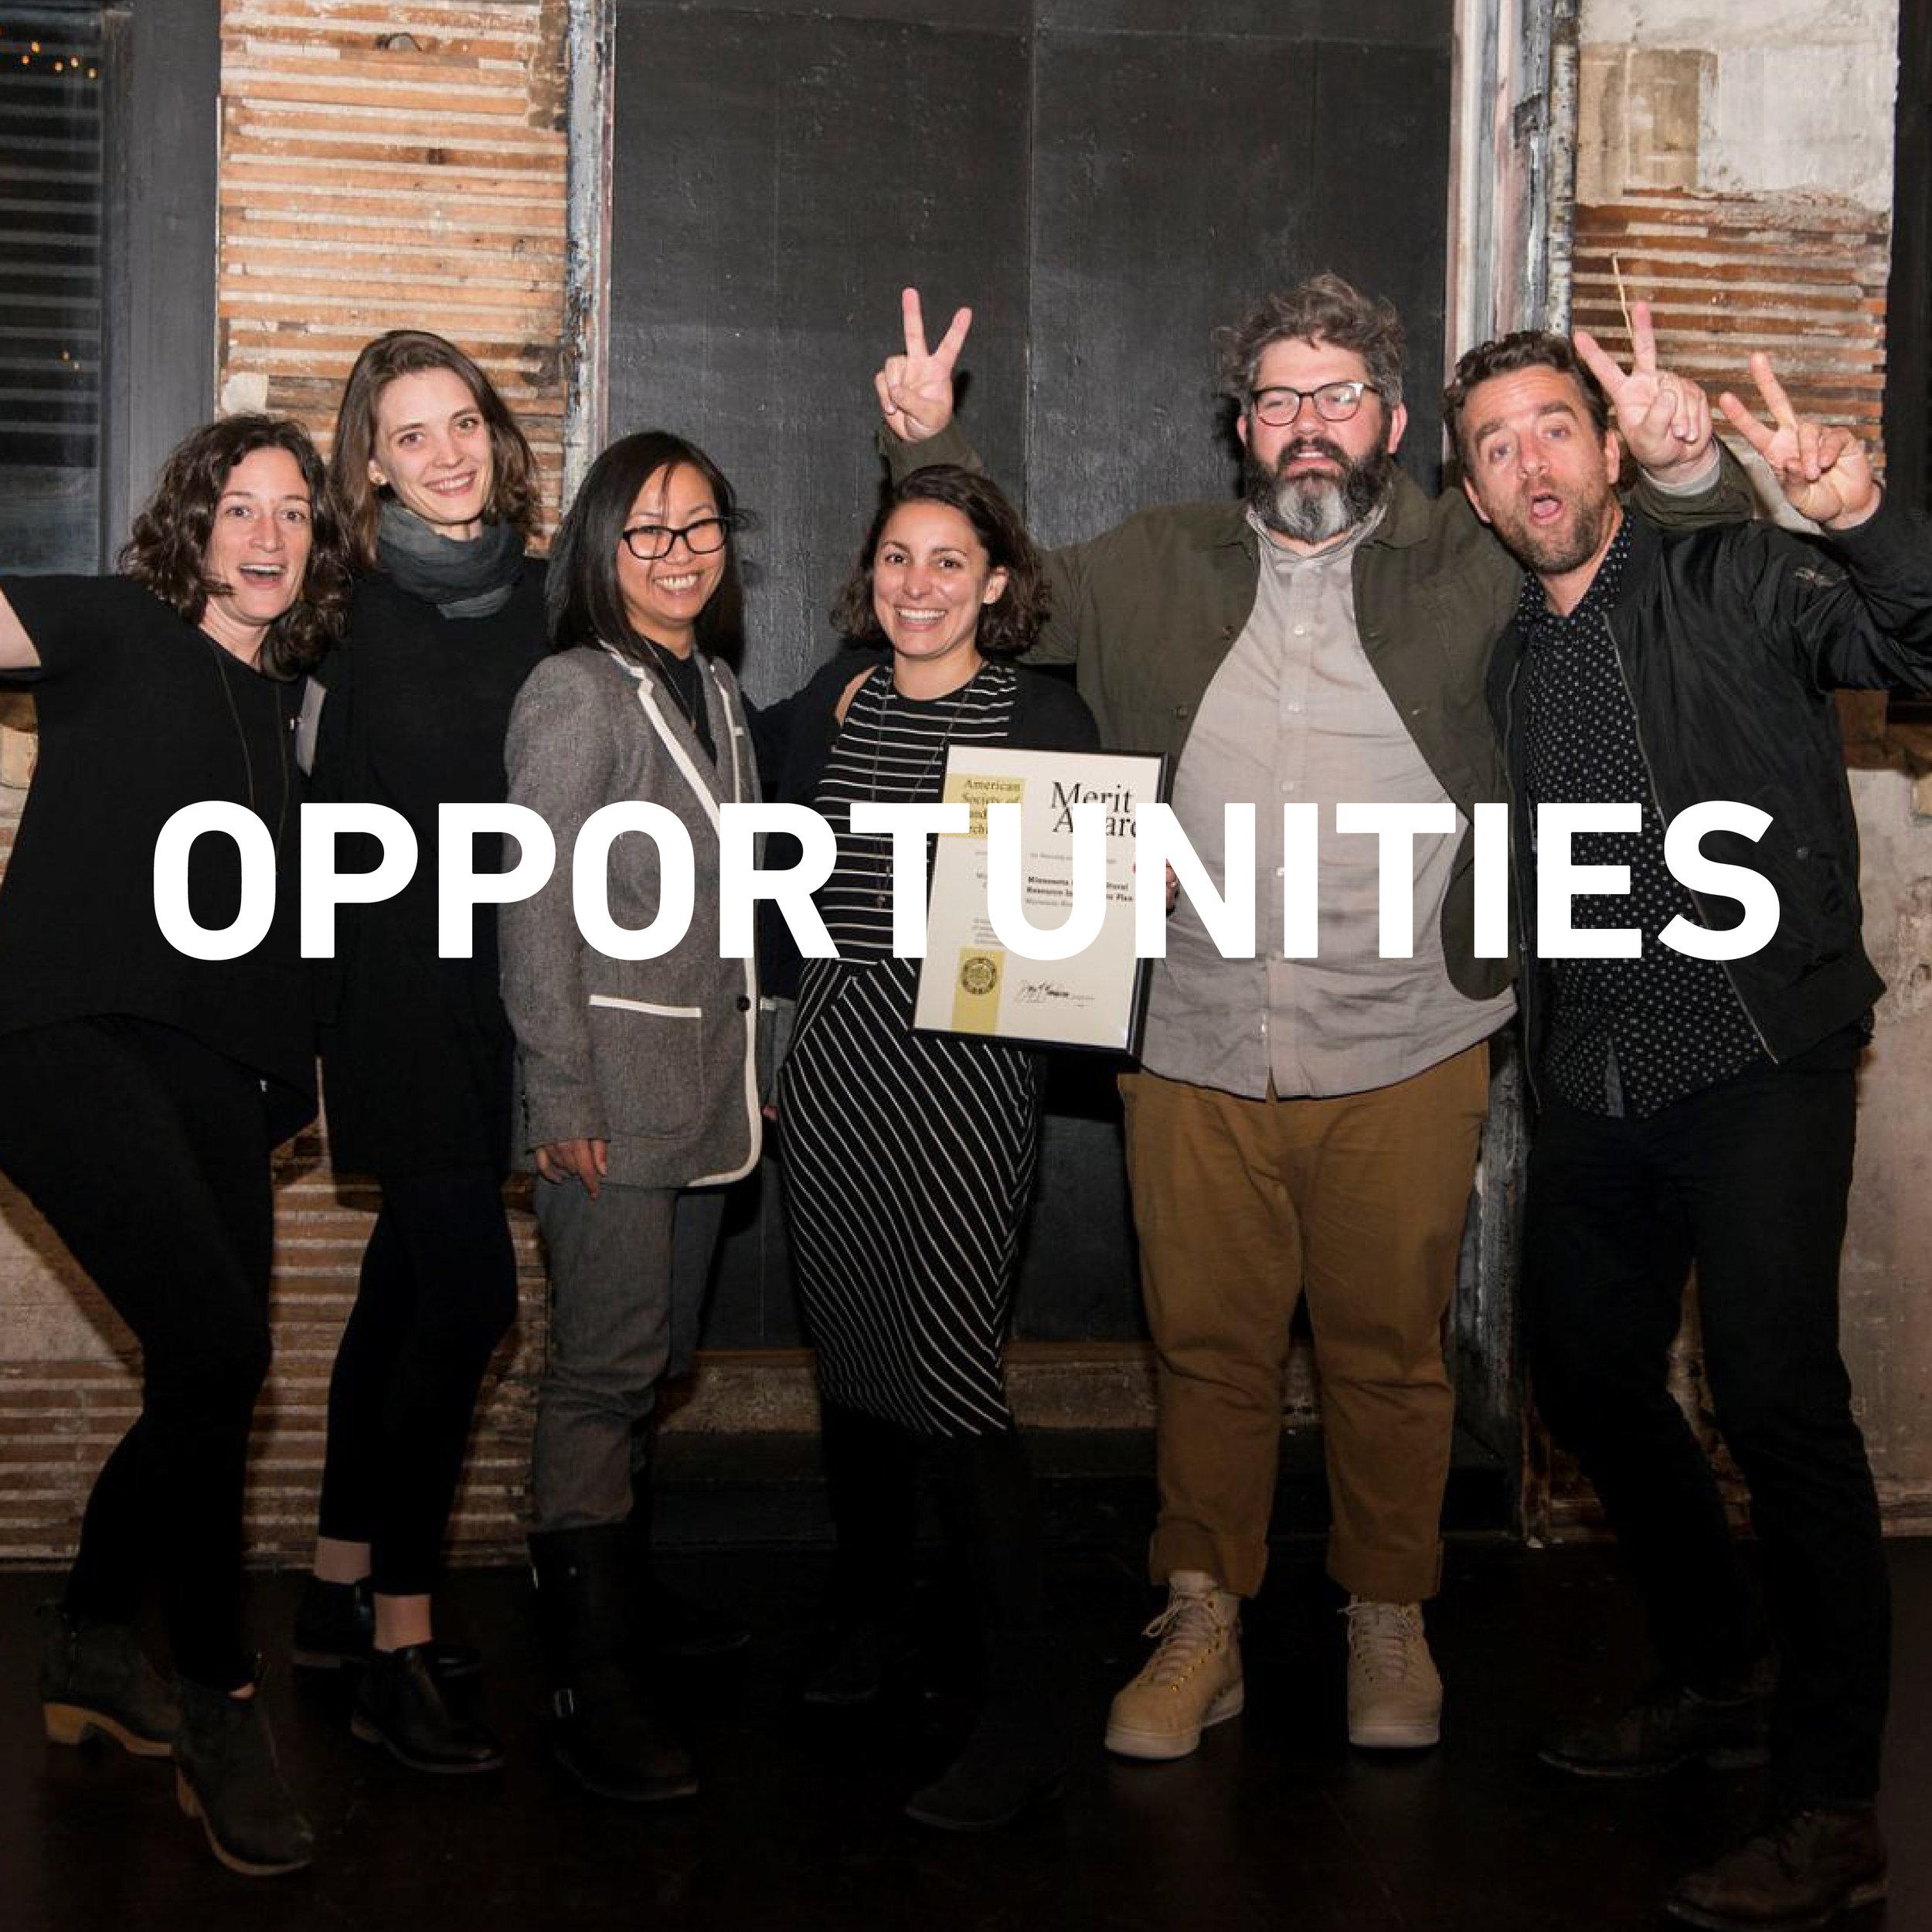 opportunities-01.jpg